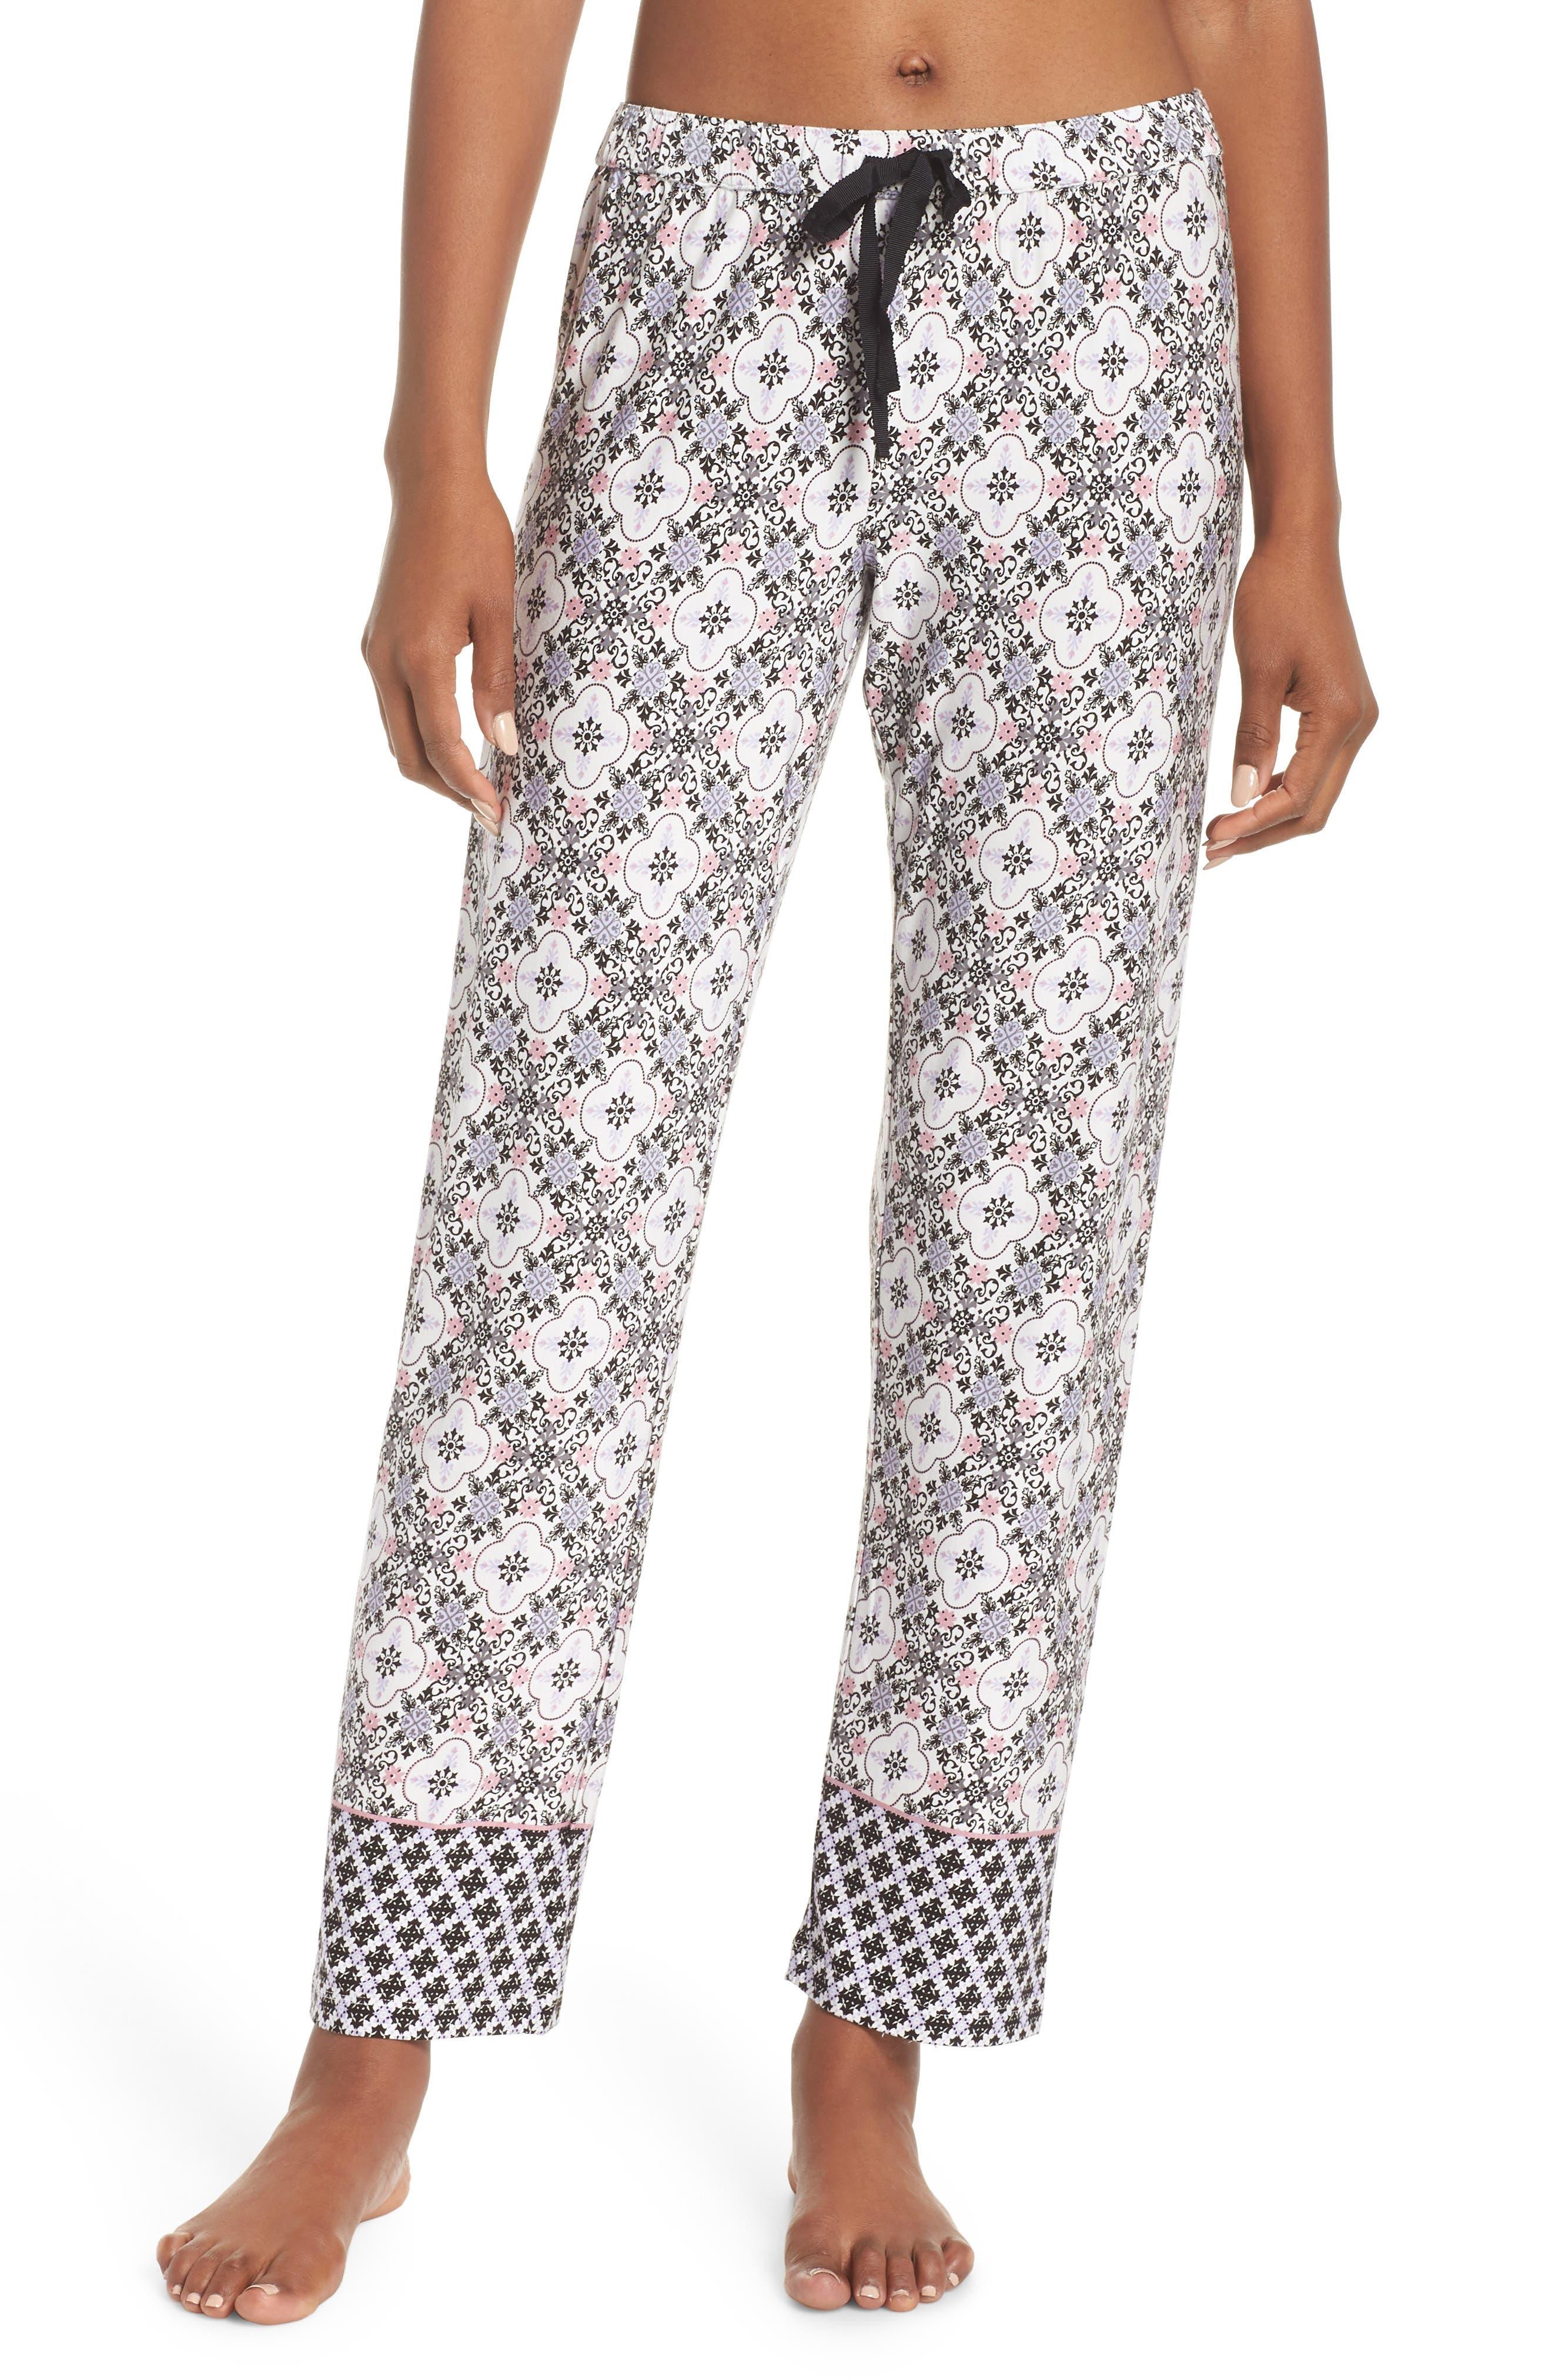 Ankle Pajama Pants,                             Main thumbnail 1, color,                             901